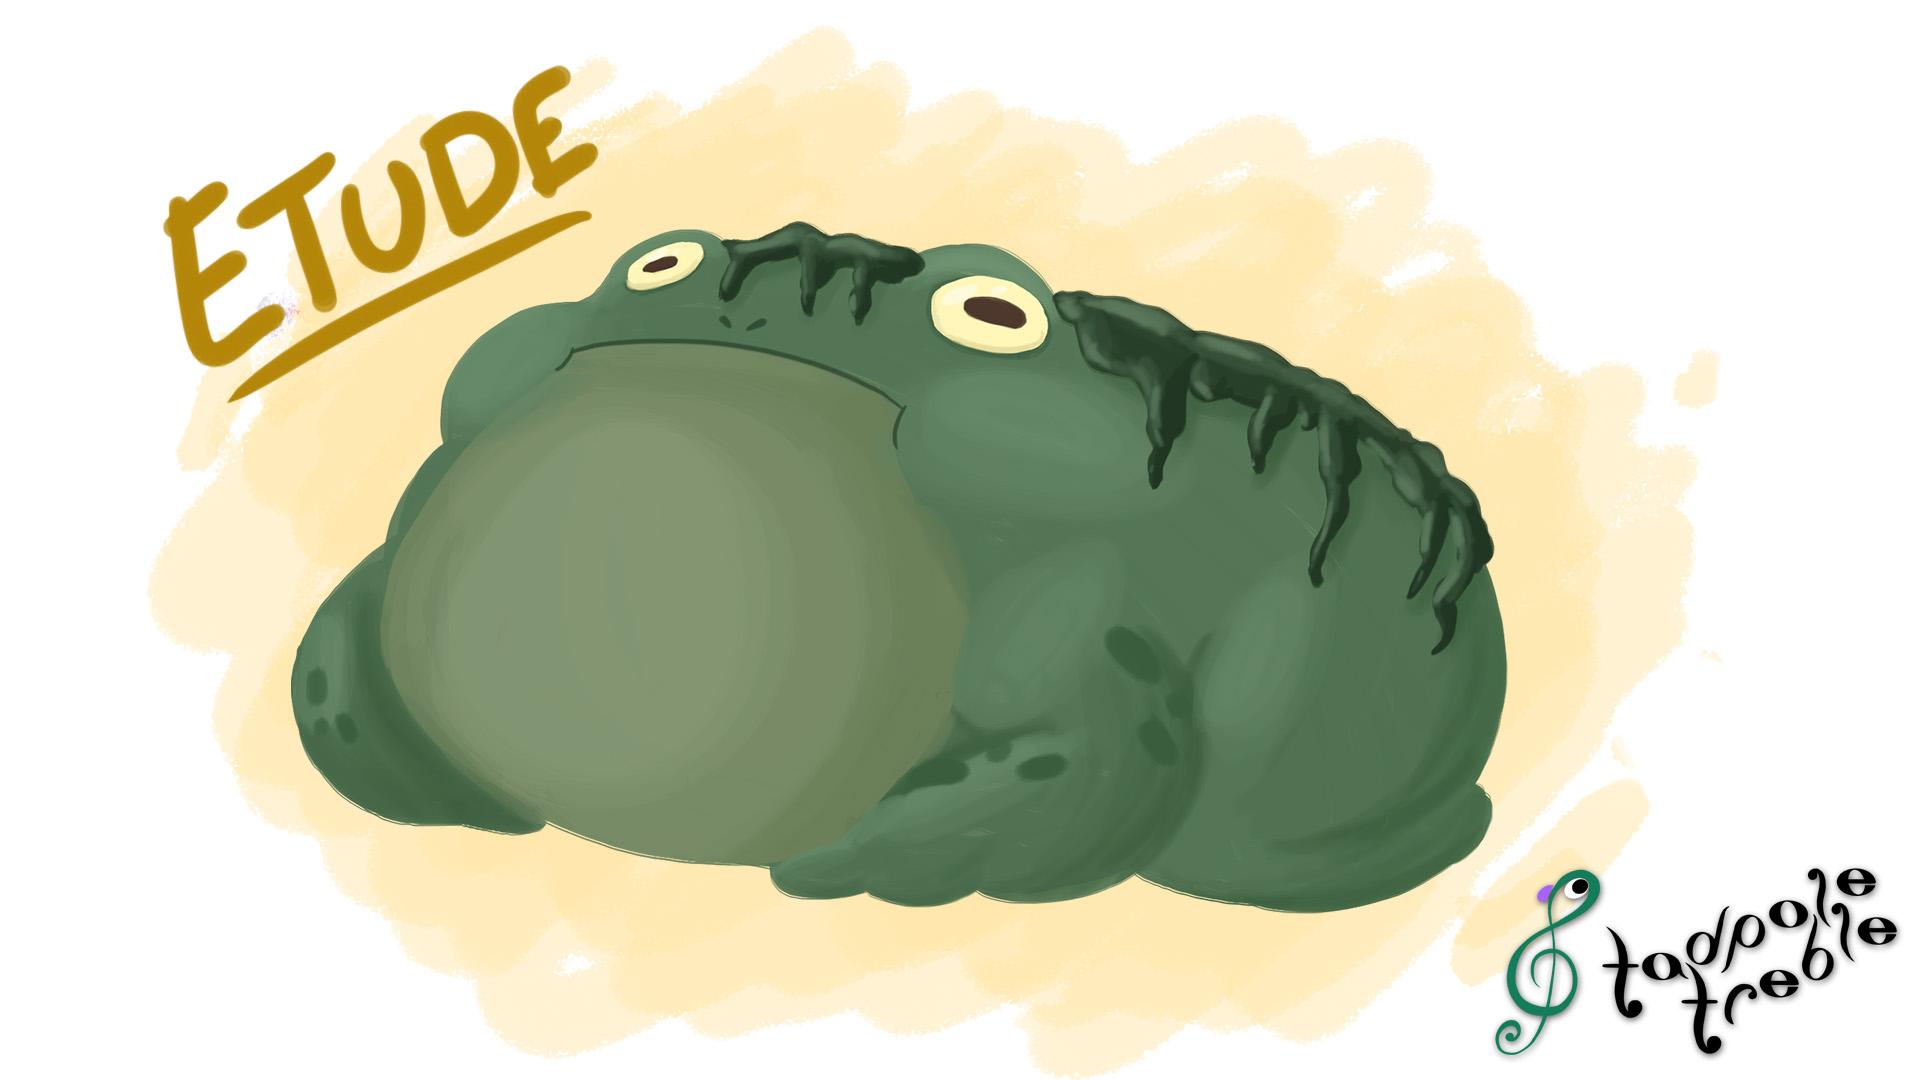 Steam Card Exchange Showcase Tadpole Treble Radiant Backpack Alligator 4 Of 8artwork Etude